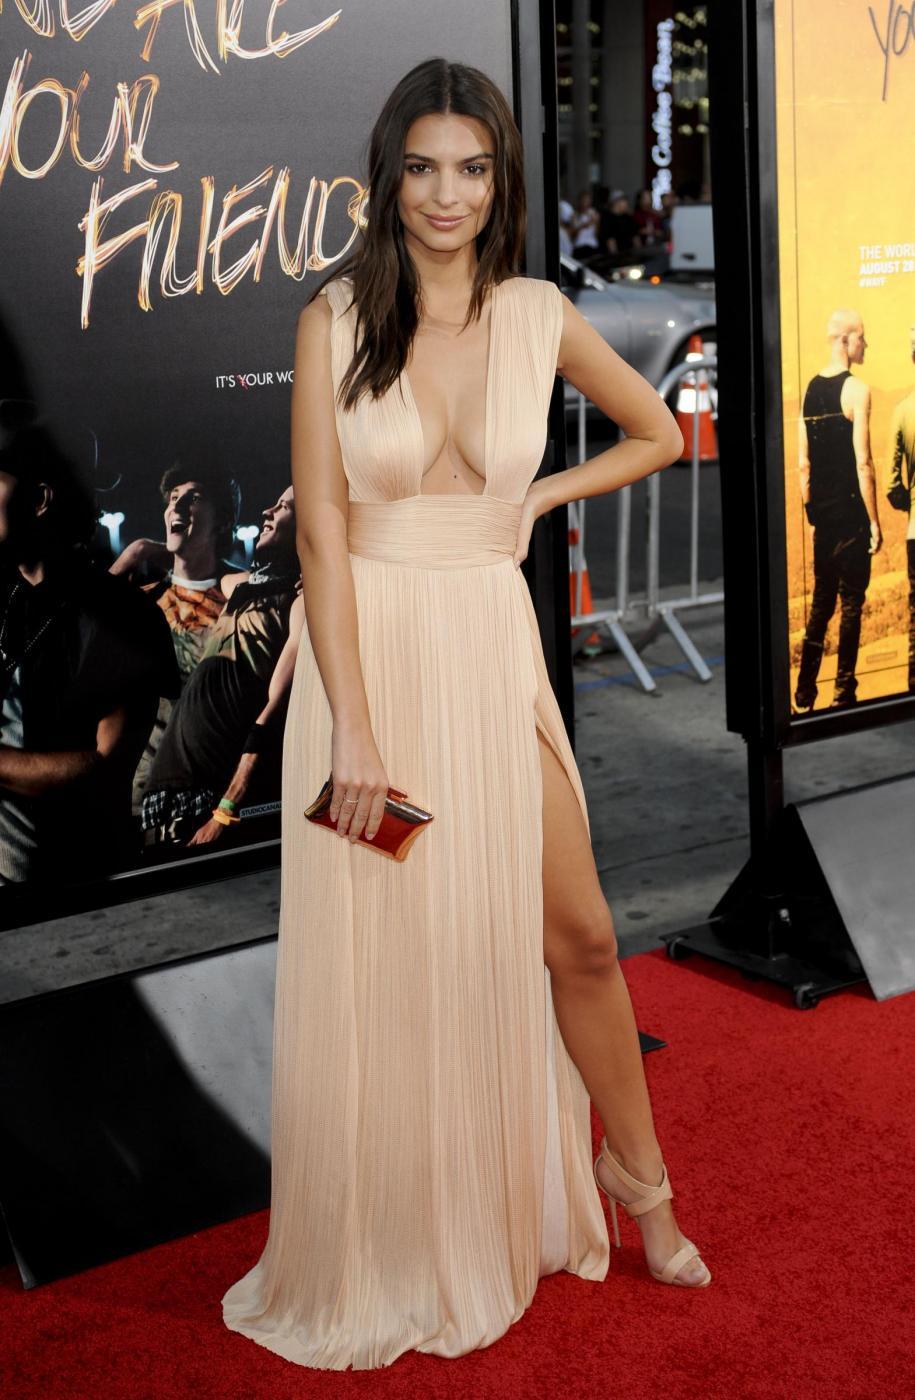 Emily Ratajkowski: scollatura da urlo a Hollywood FOTO 5